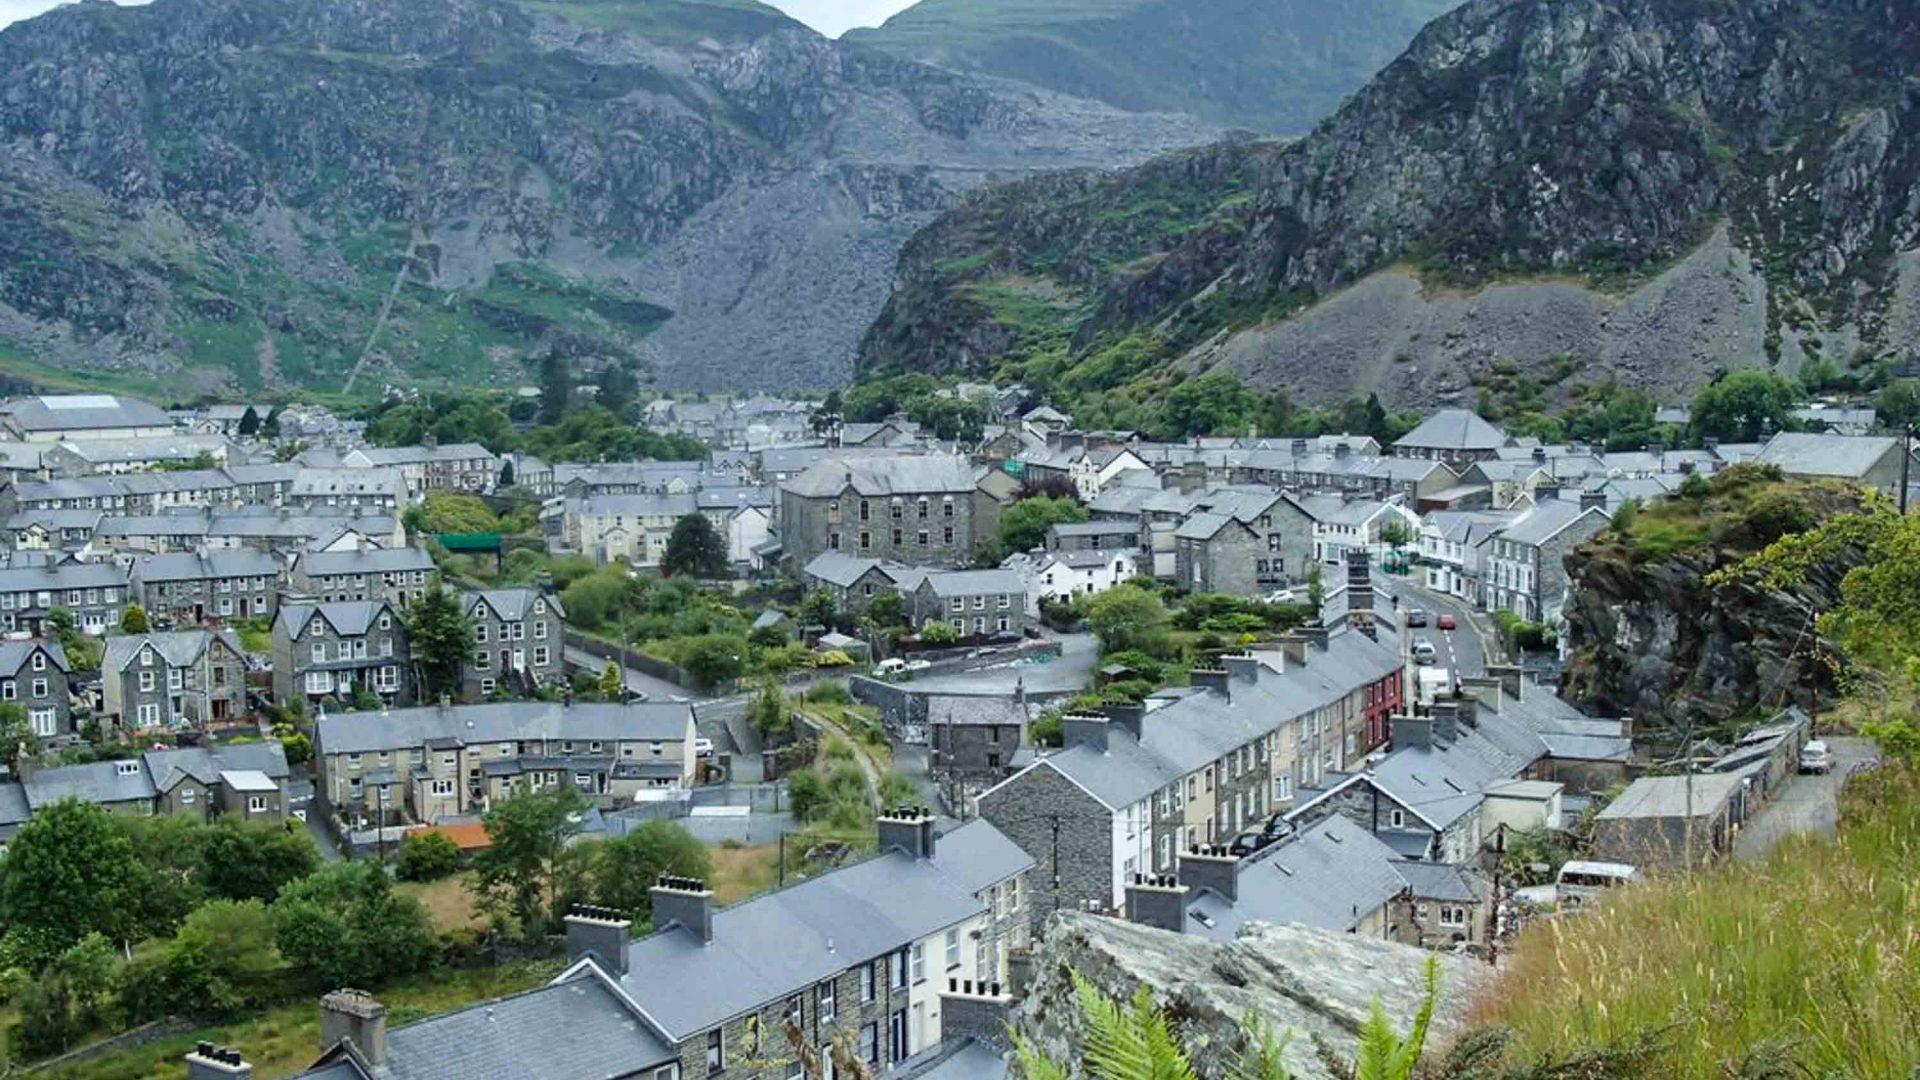 Views over Blaenau Ffestiniog, north Wales.